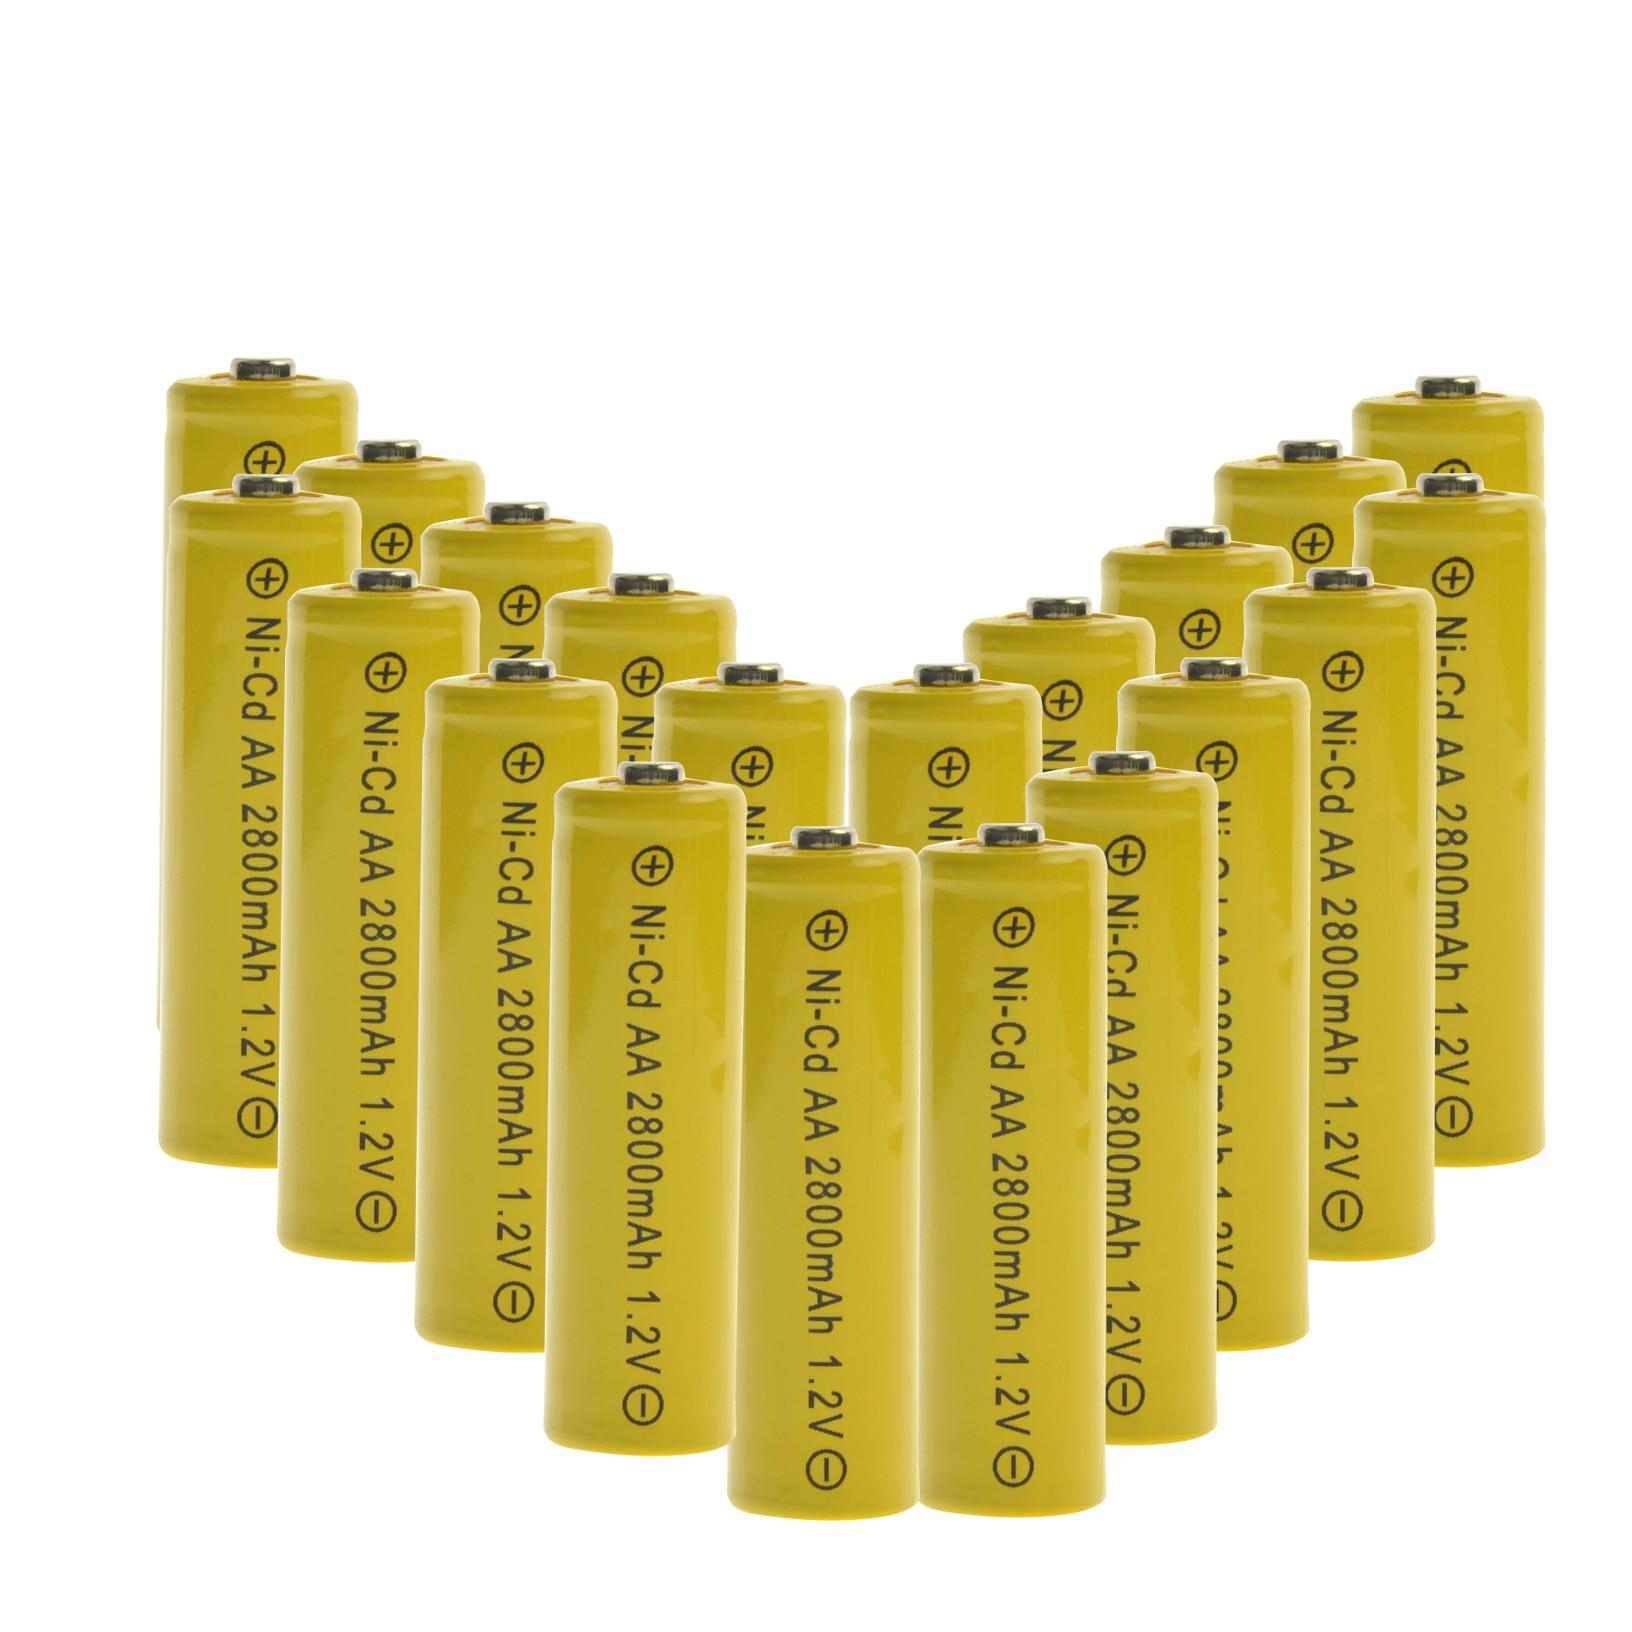 Paquete de 20 NI-CD nueva marca AA 2800mah 1,2 V batería recargable para juguete de luz led mp3 envío gratis amarillo LR06 2A